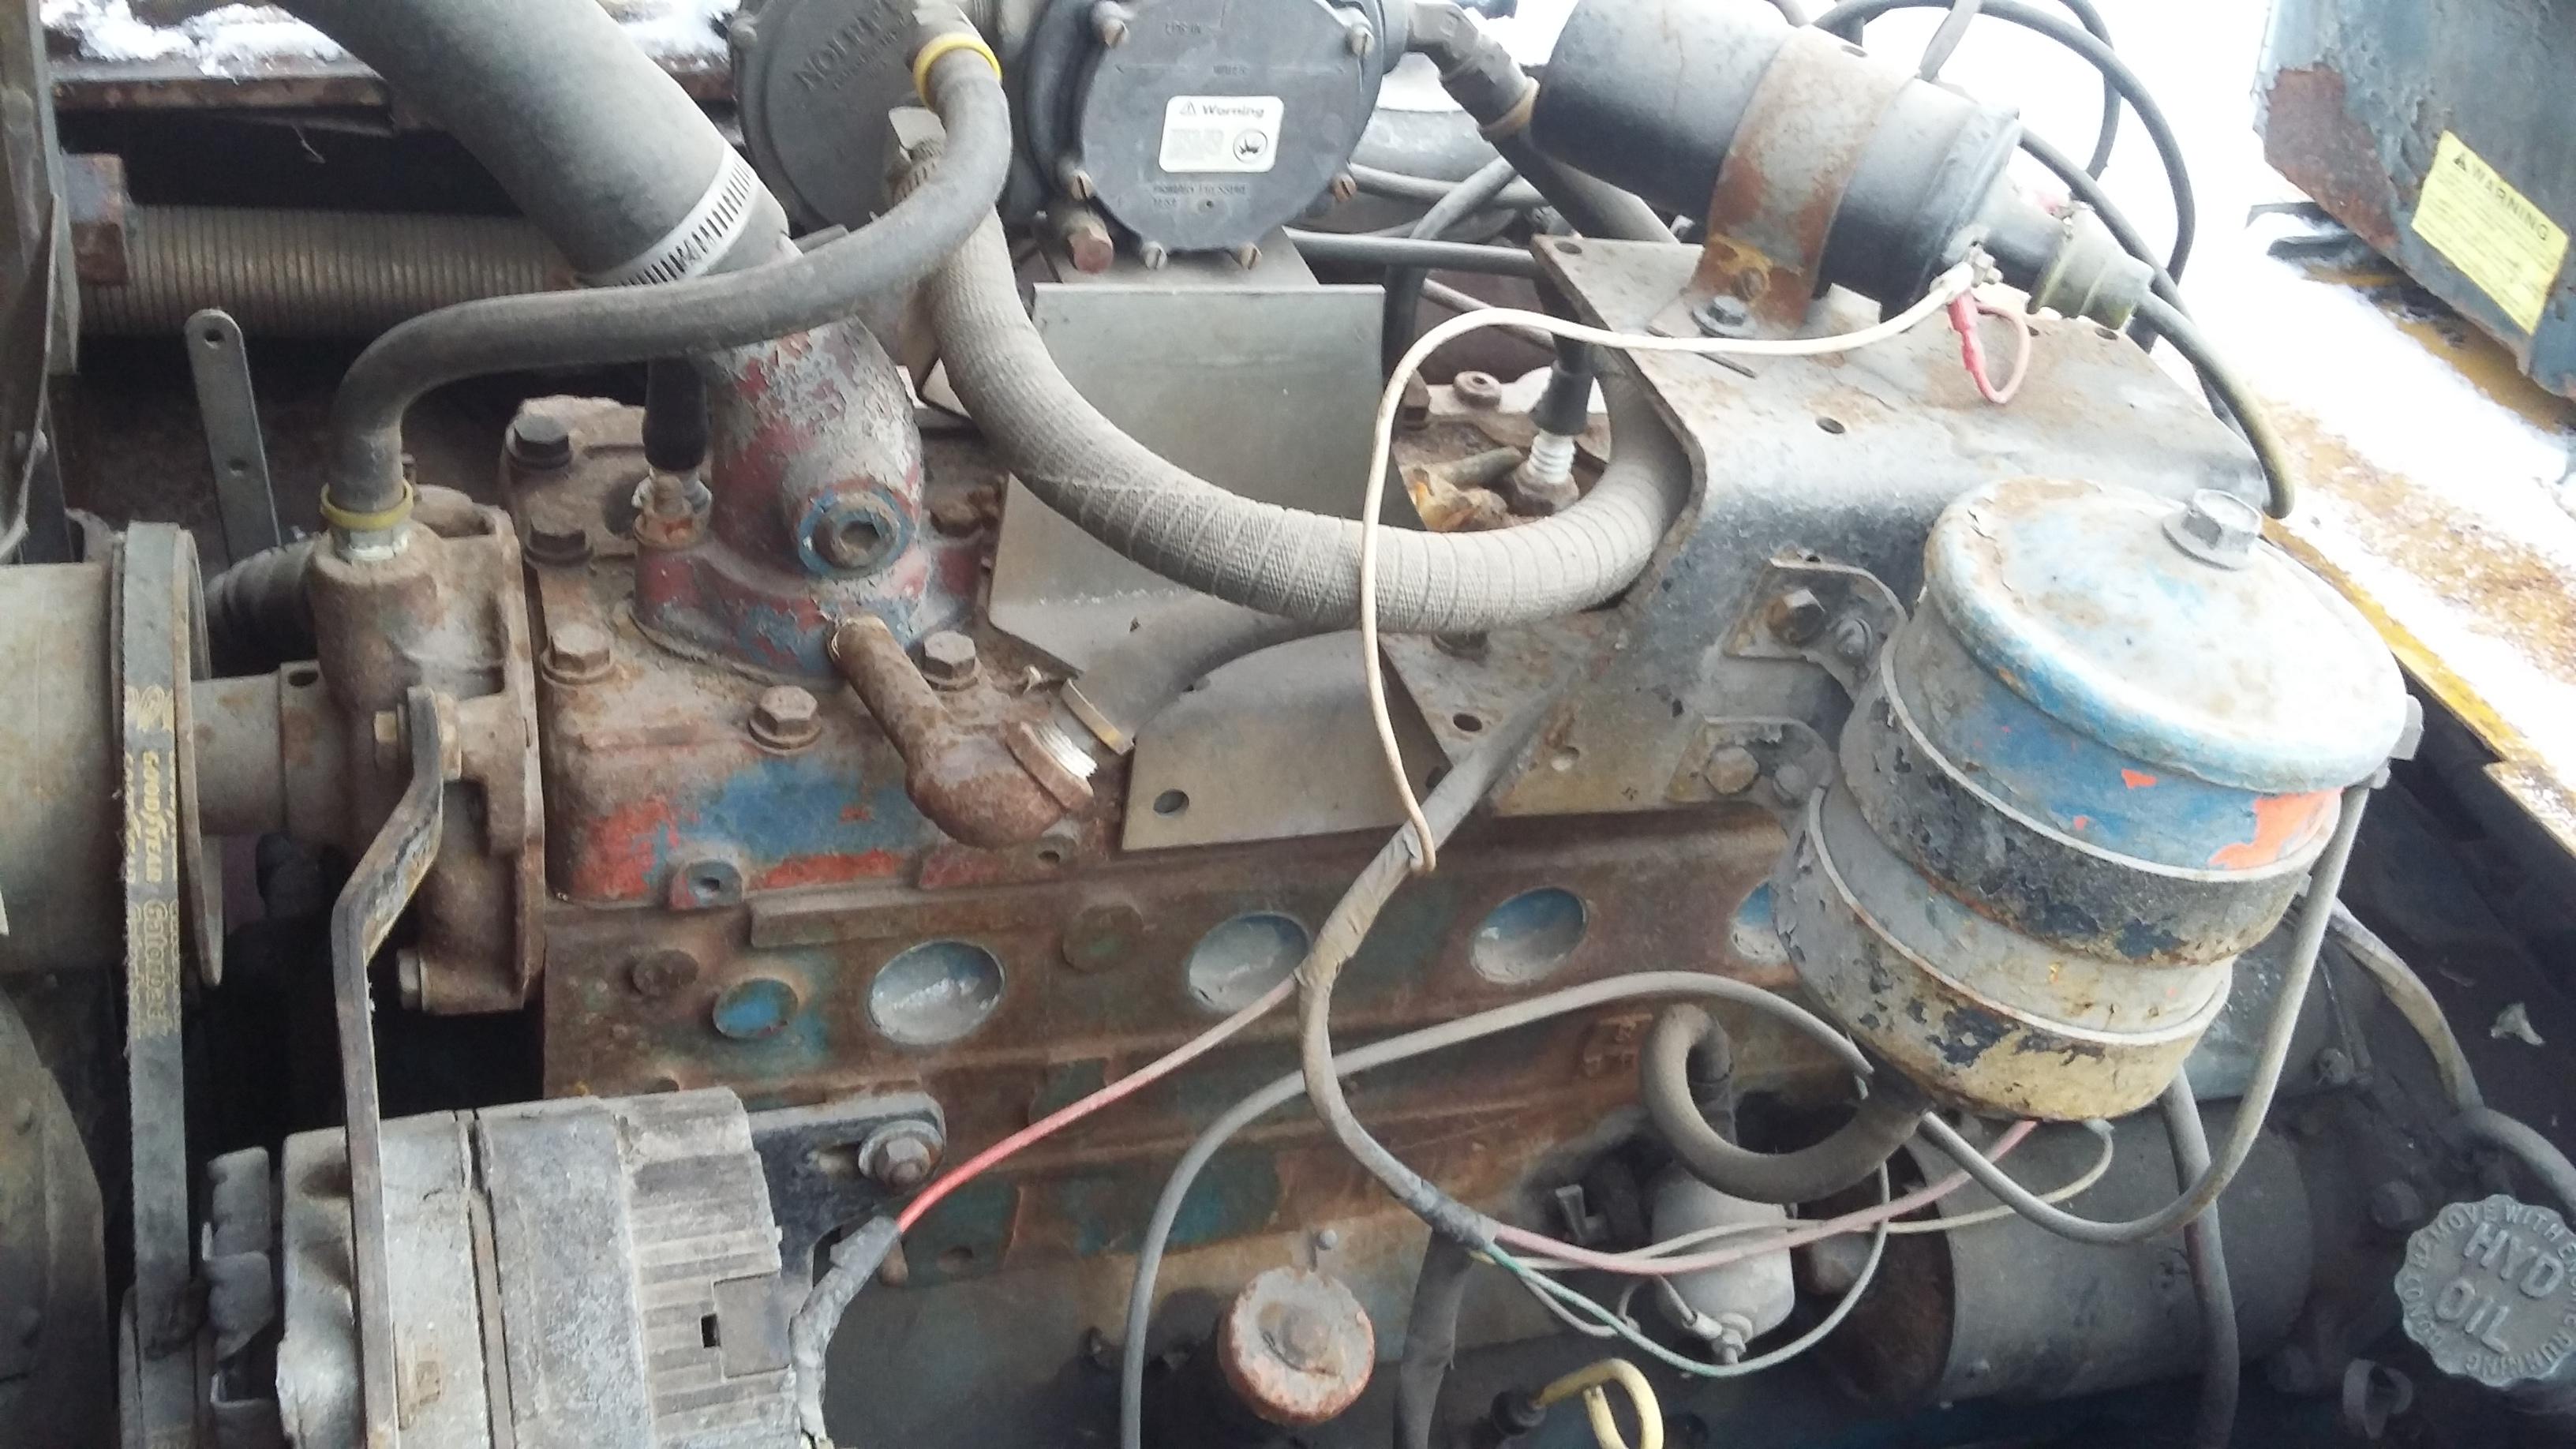 I have an old forklift hyster model H80C serial C5D 3639 H itis